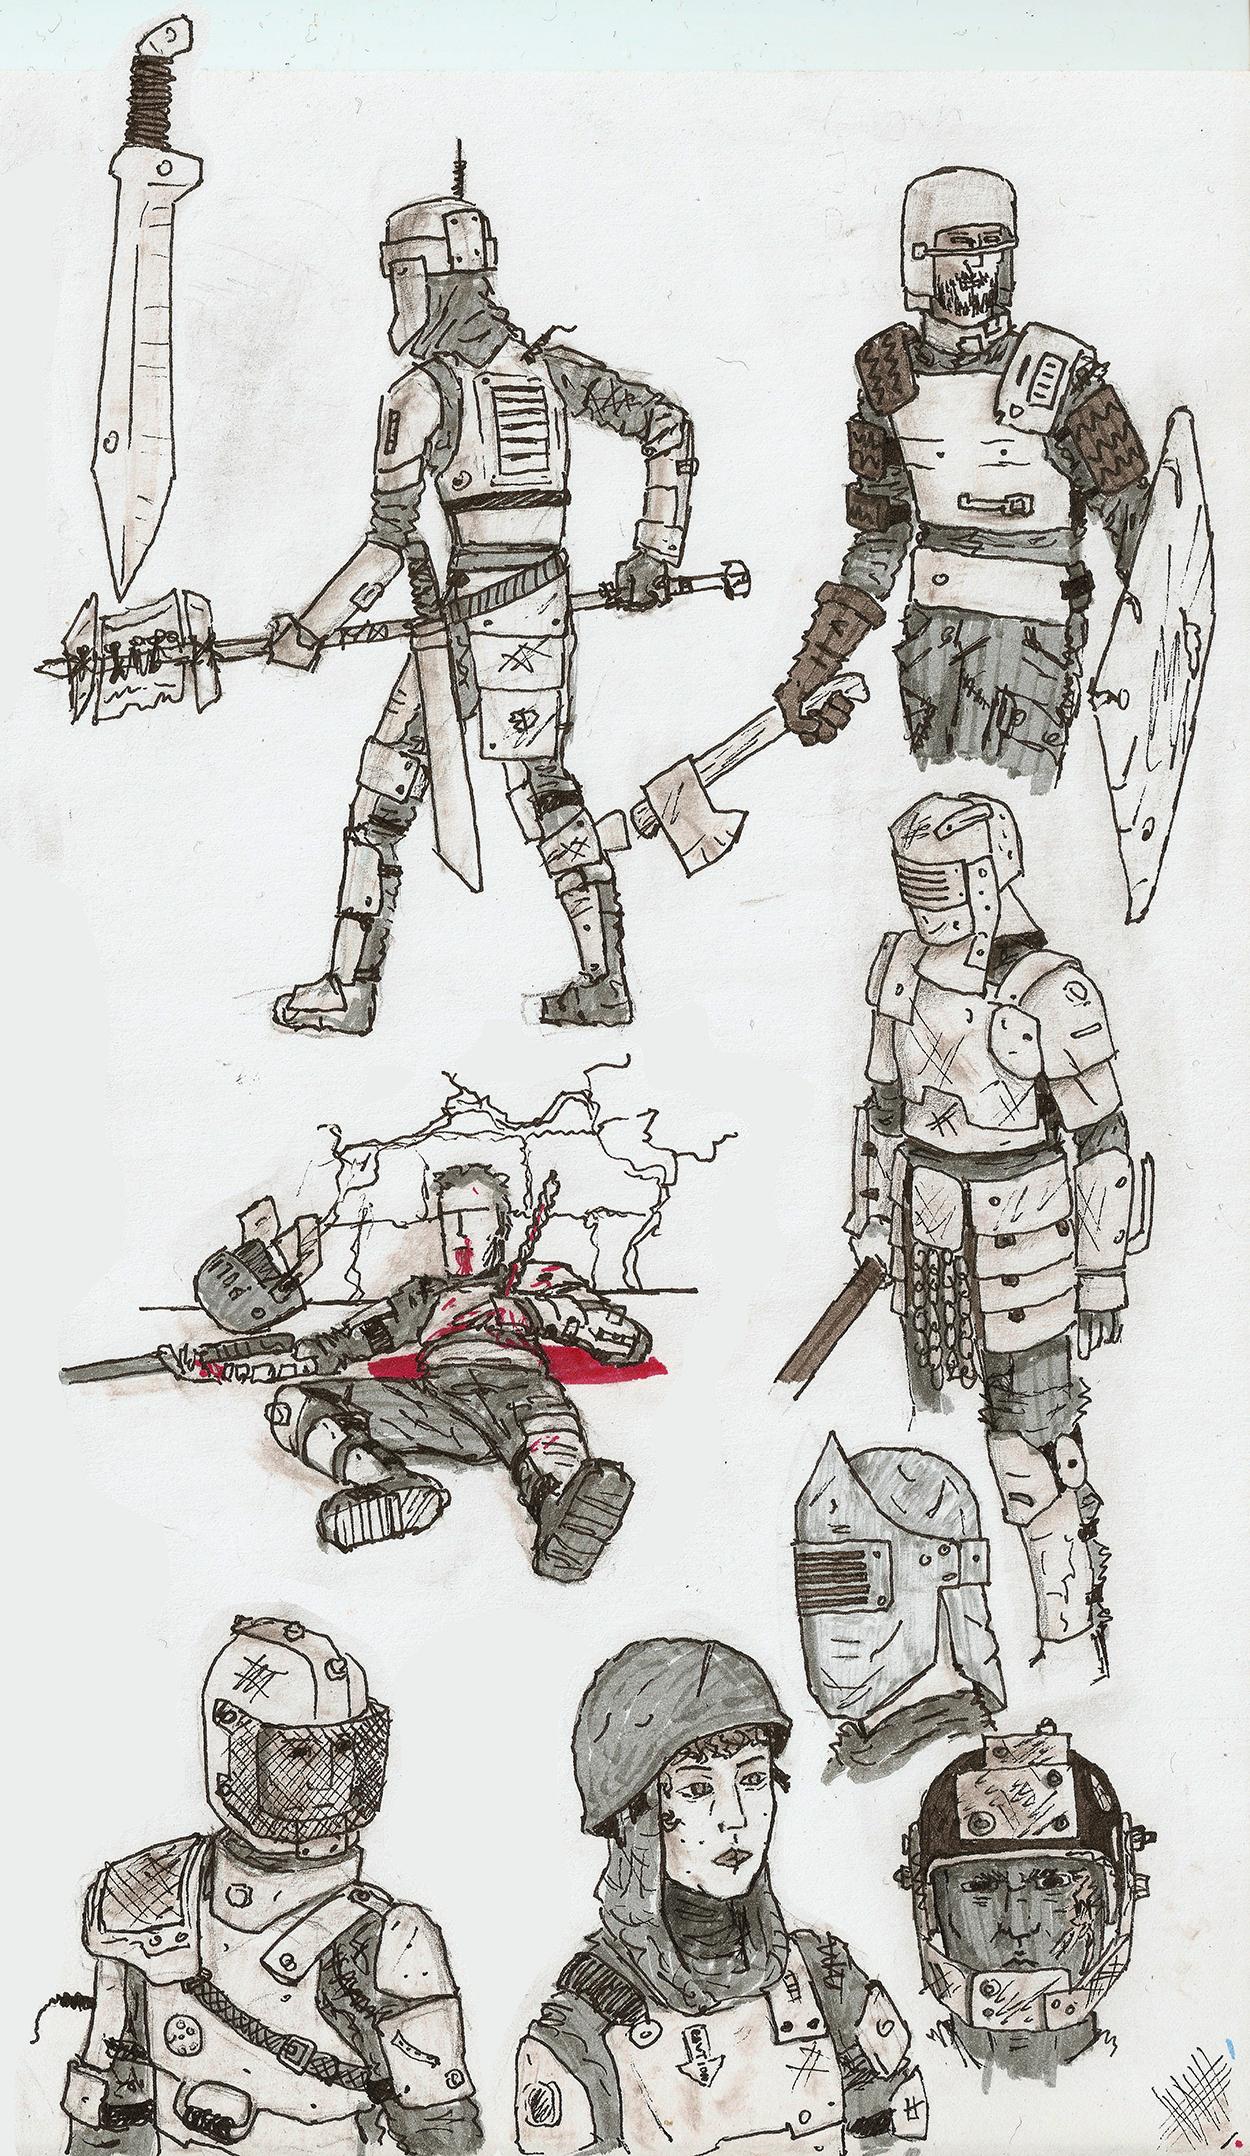 Junk Soldiers